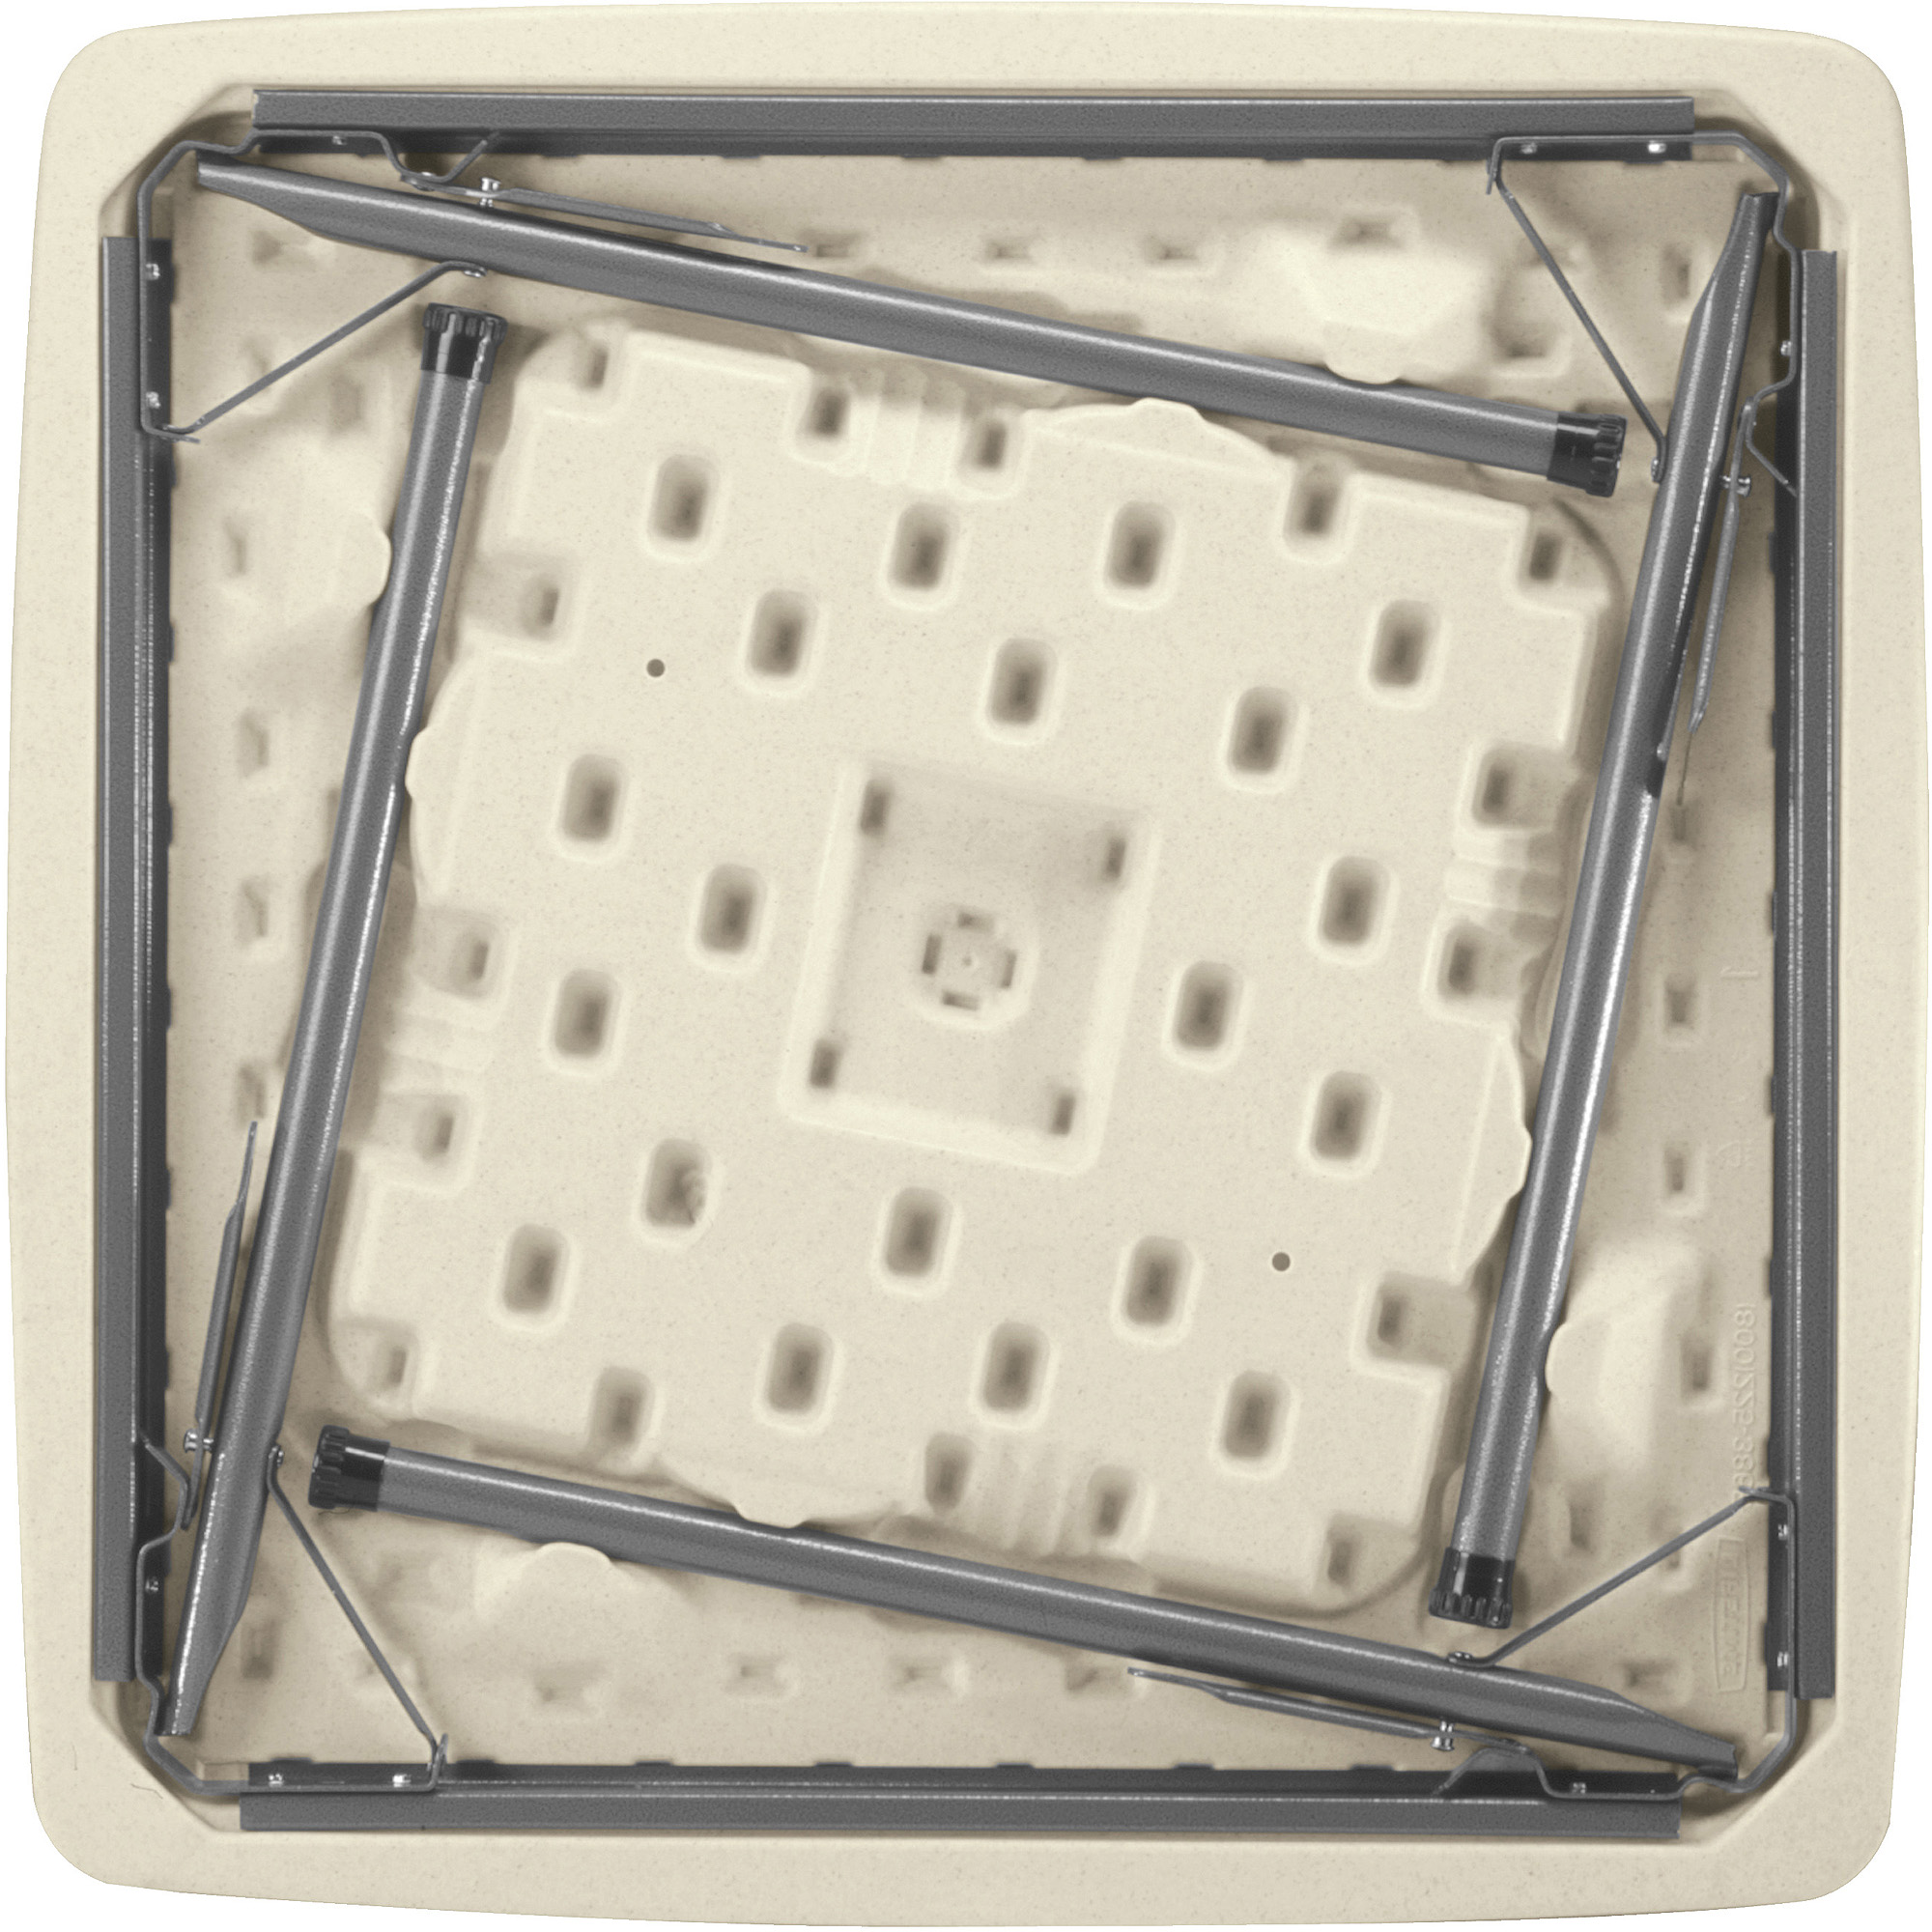 Lifetime 37 square folding table walmart watchthetrailerfo